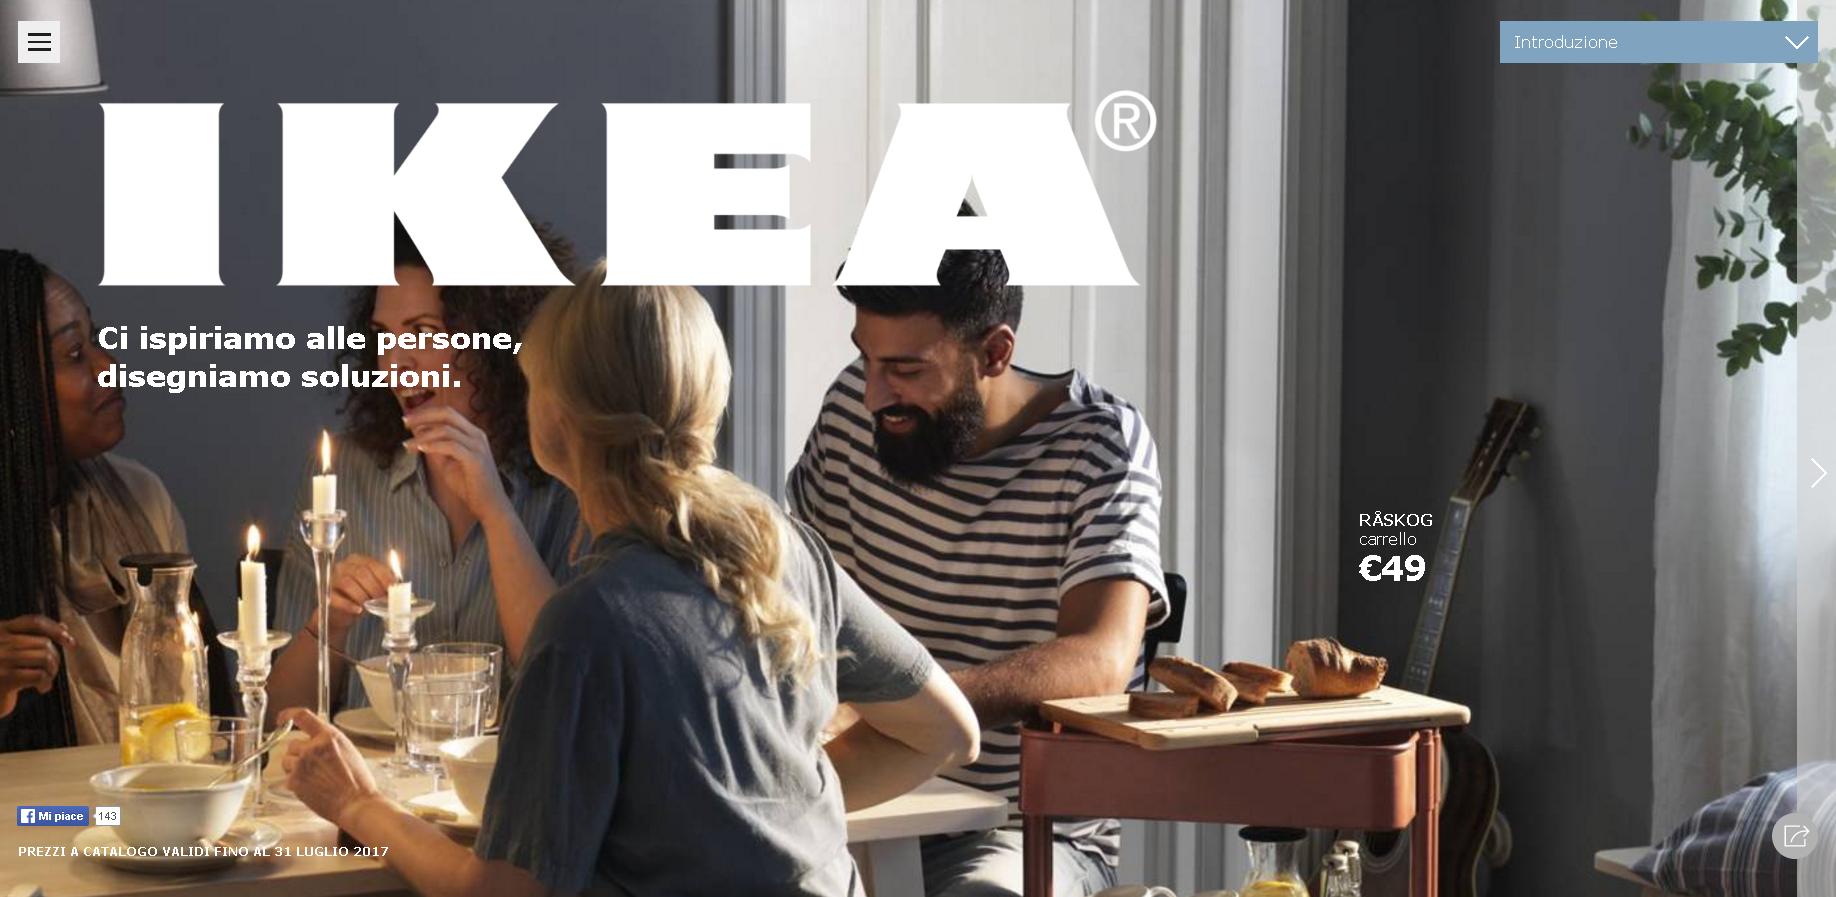 sfoglia gratis il catalogo ikea 2017. Black Bedroom Furniture Sets. Home Design Ideas